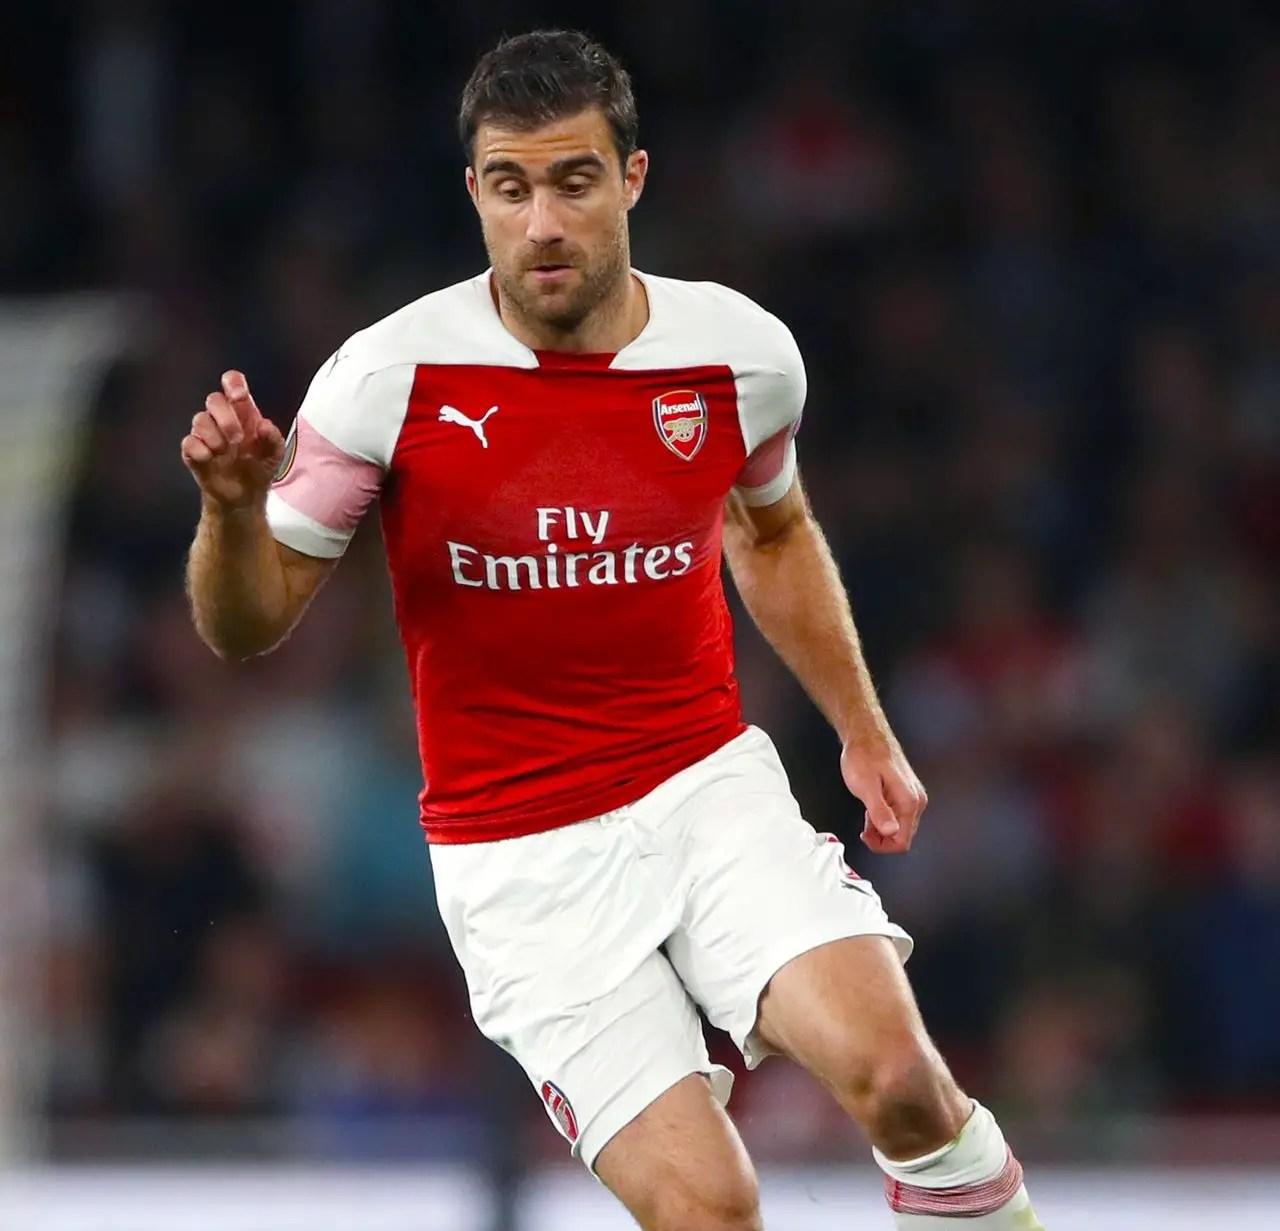 Sokratis Won't Renew Arsenal Contract